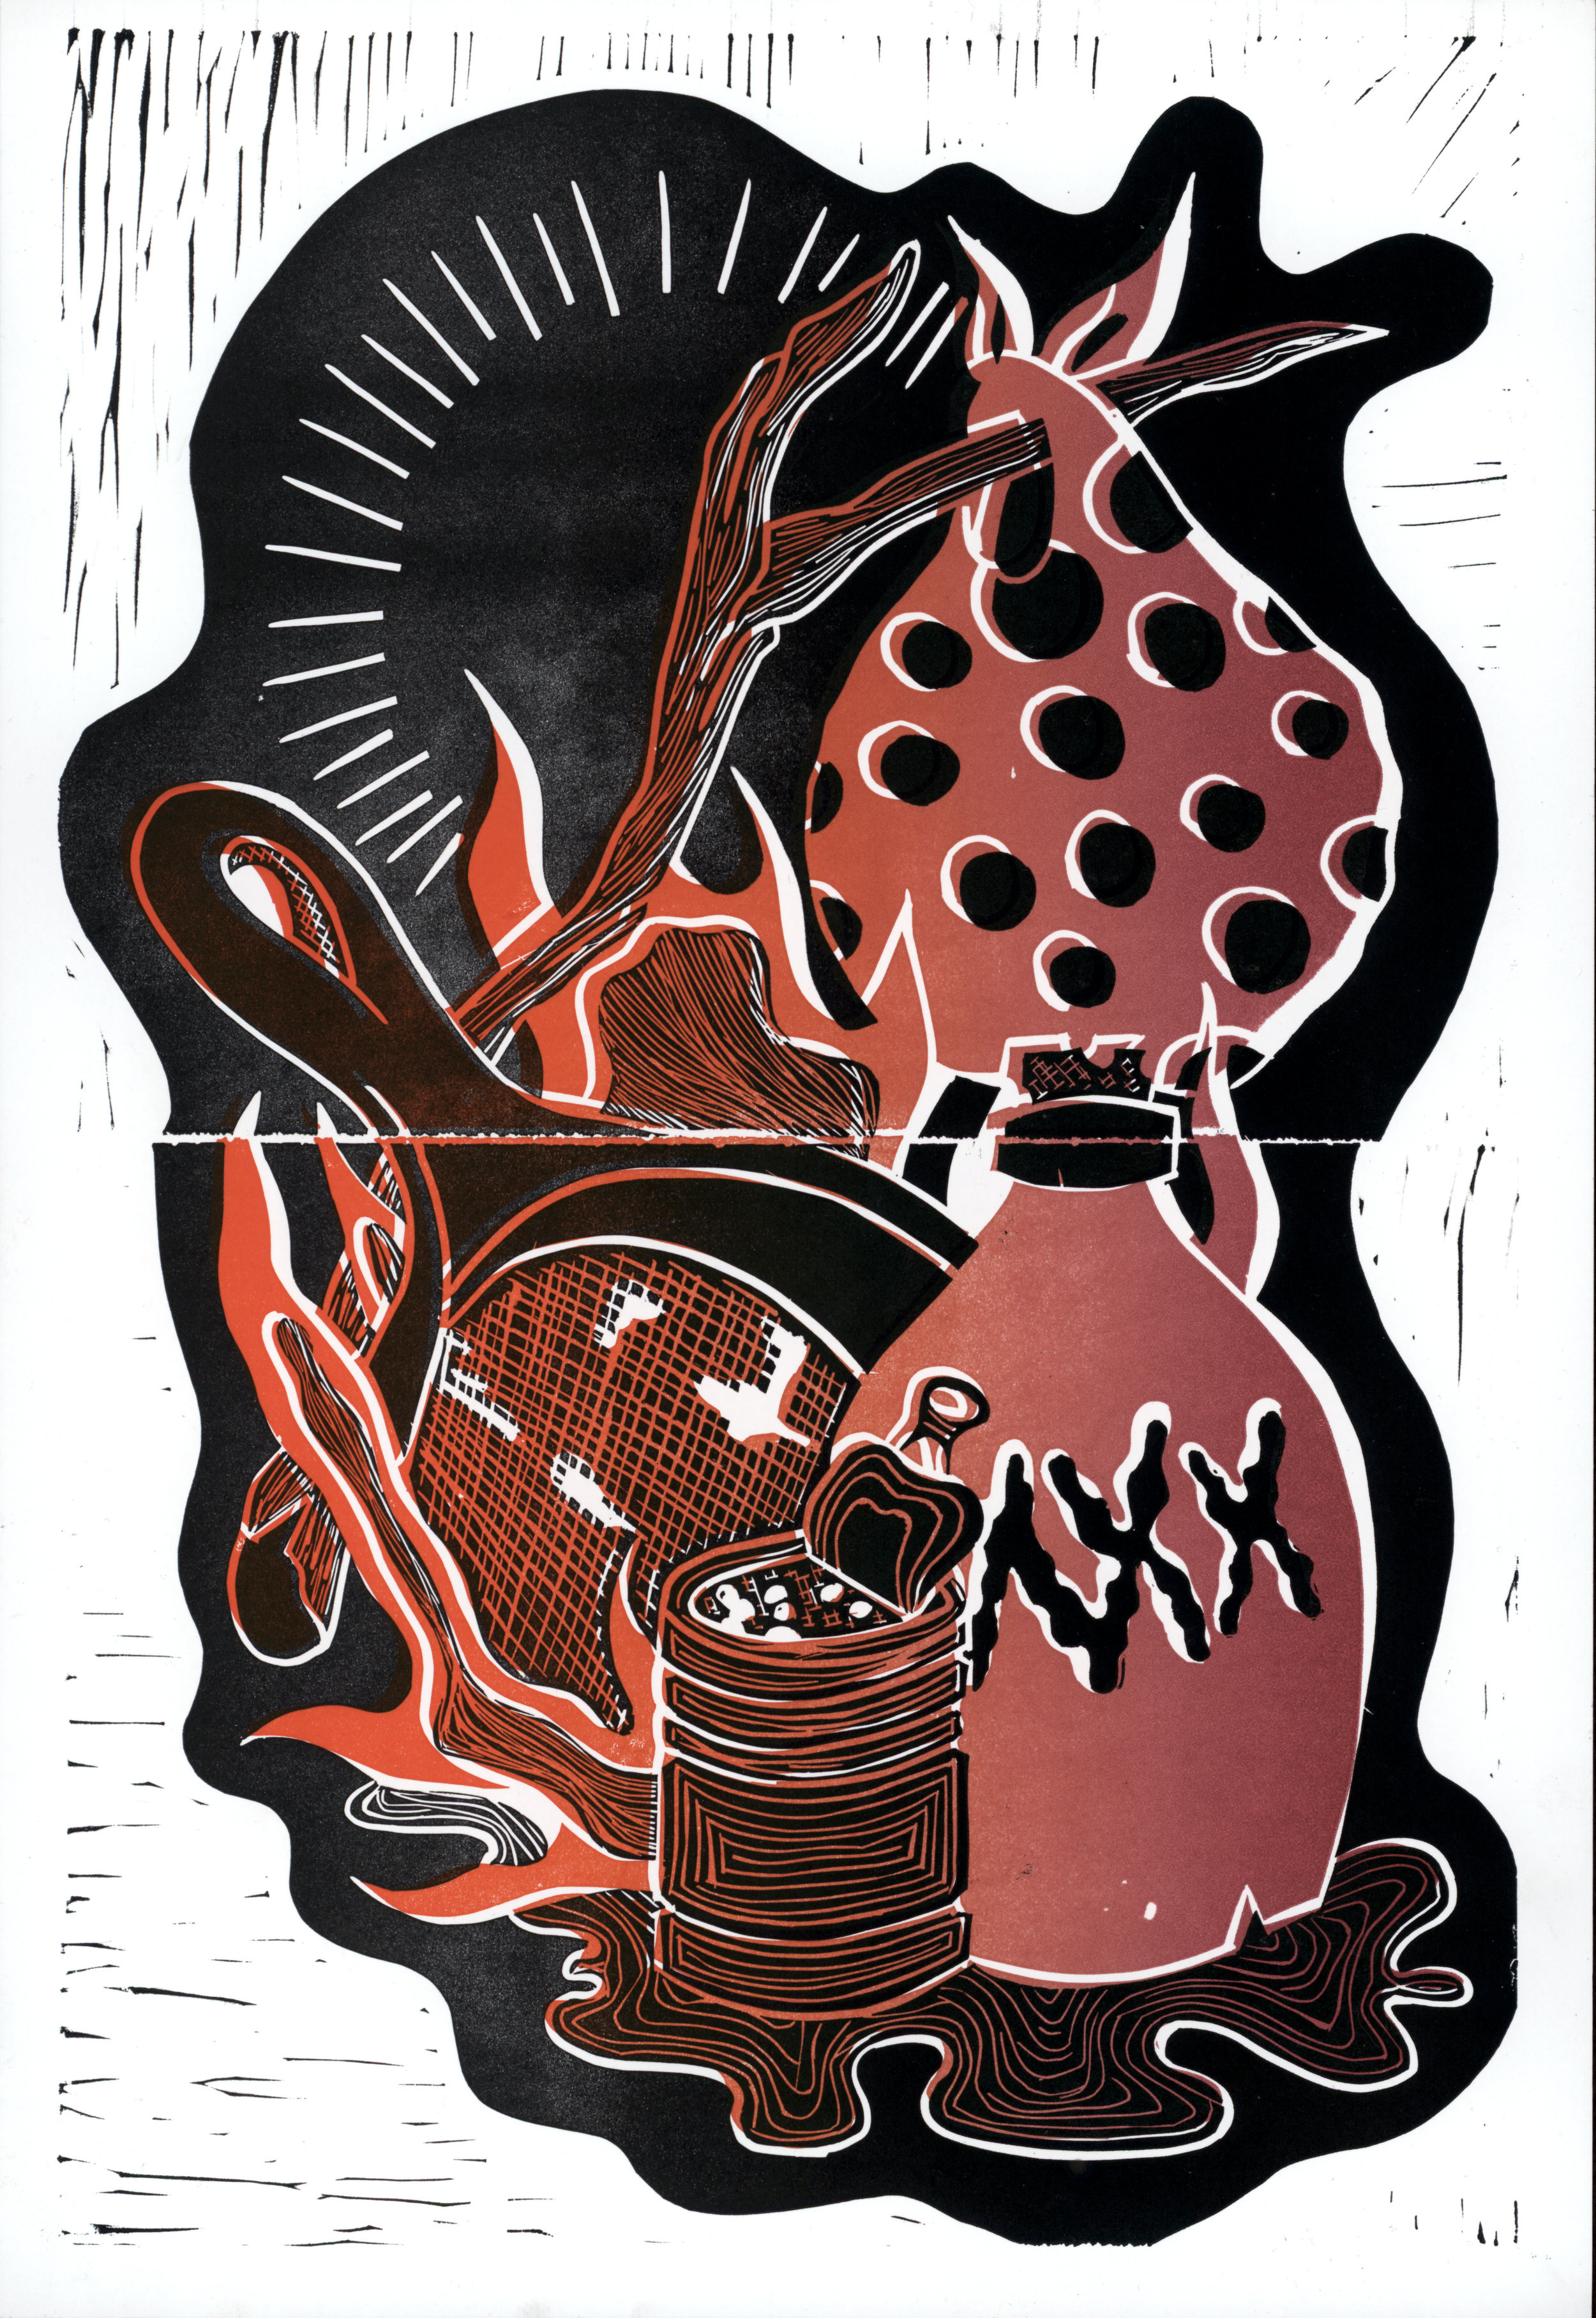 Lino-cut printed on paper via archetype press.